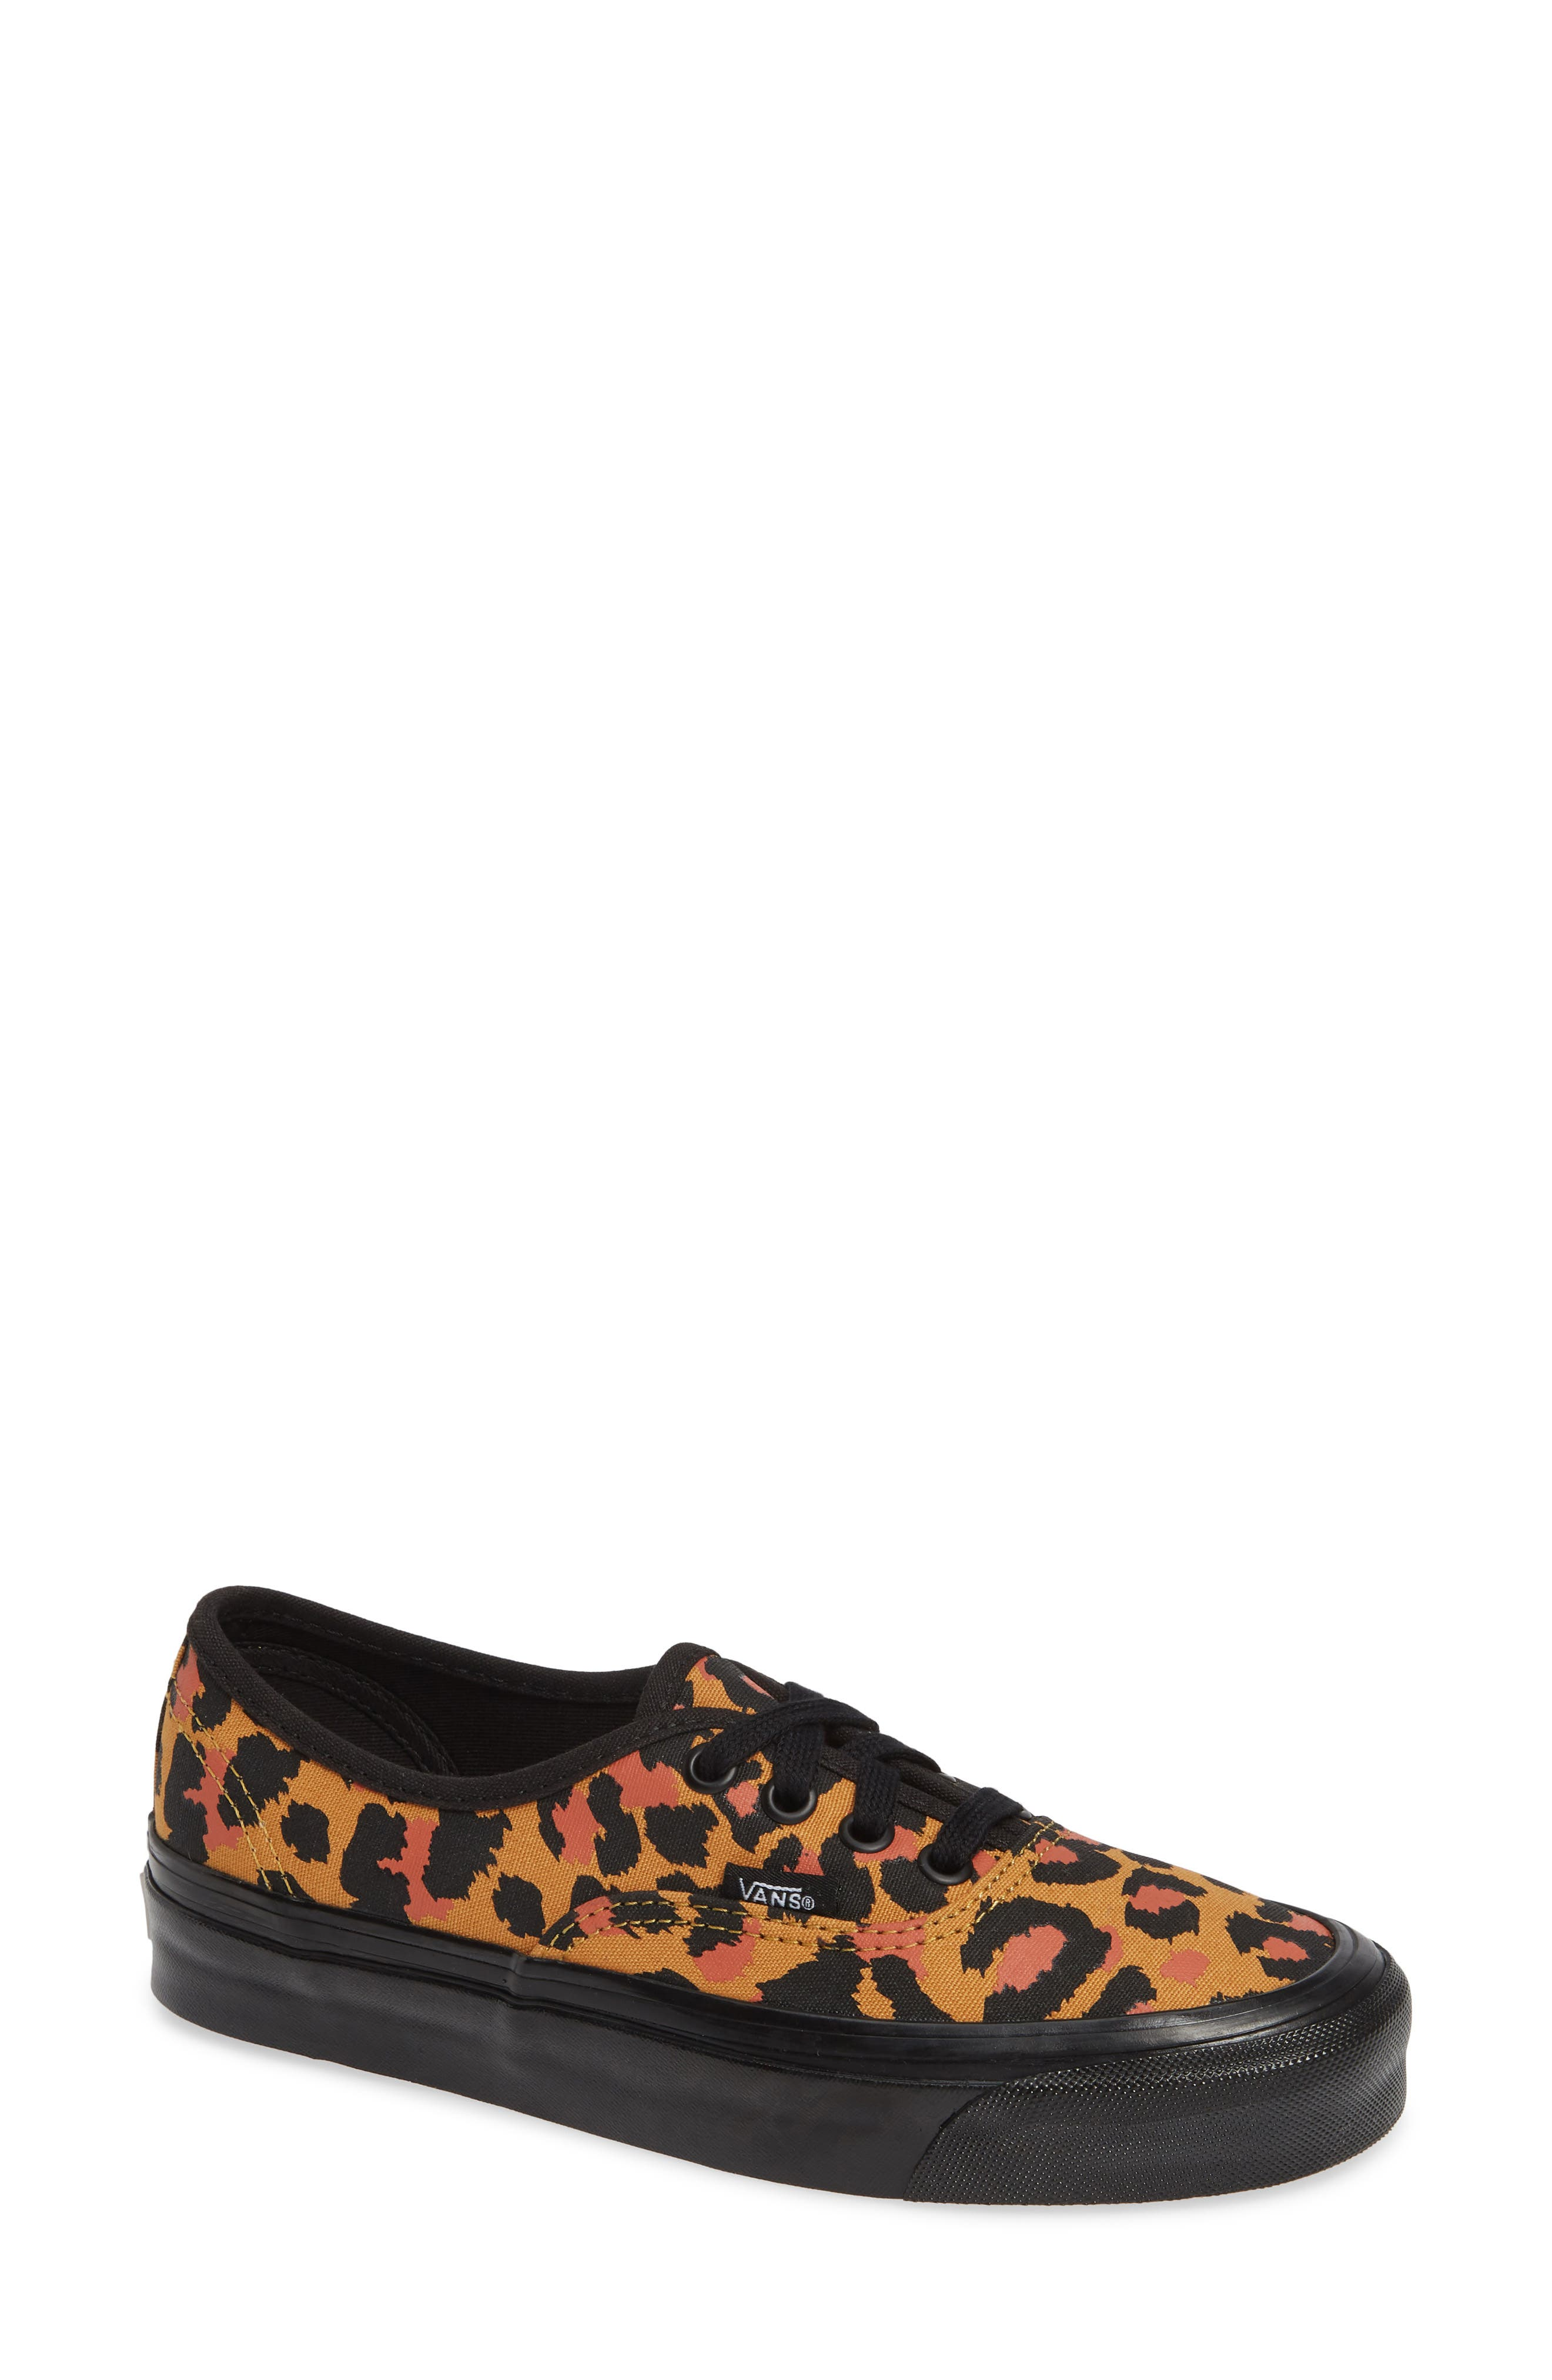 Authentic 44 Dx Sneaker in Leopard/ Black